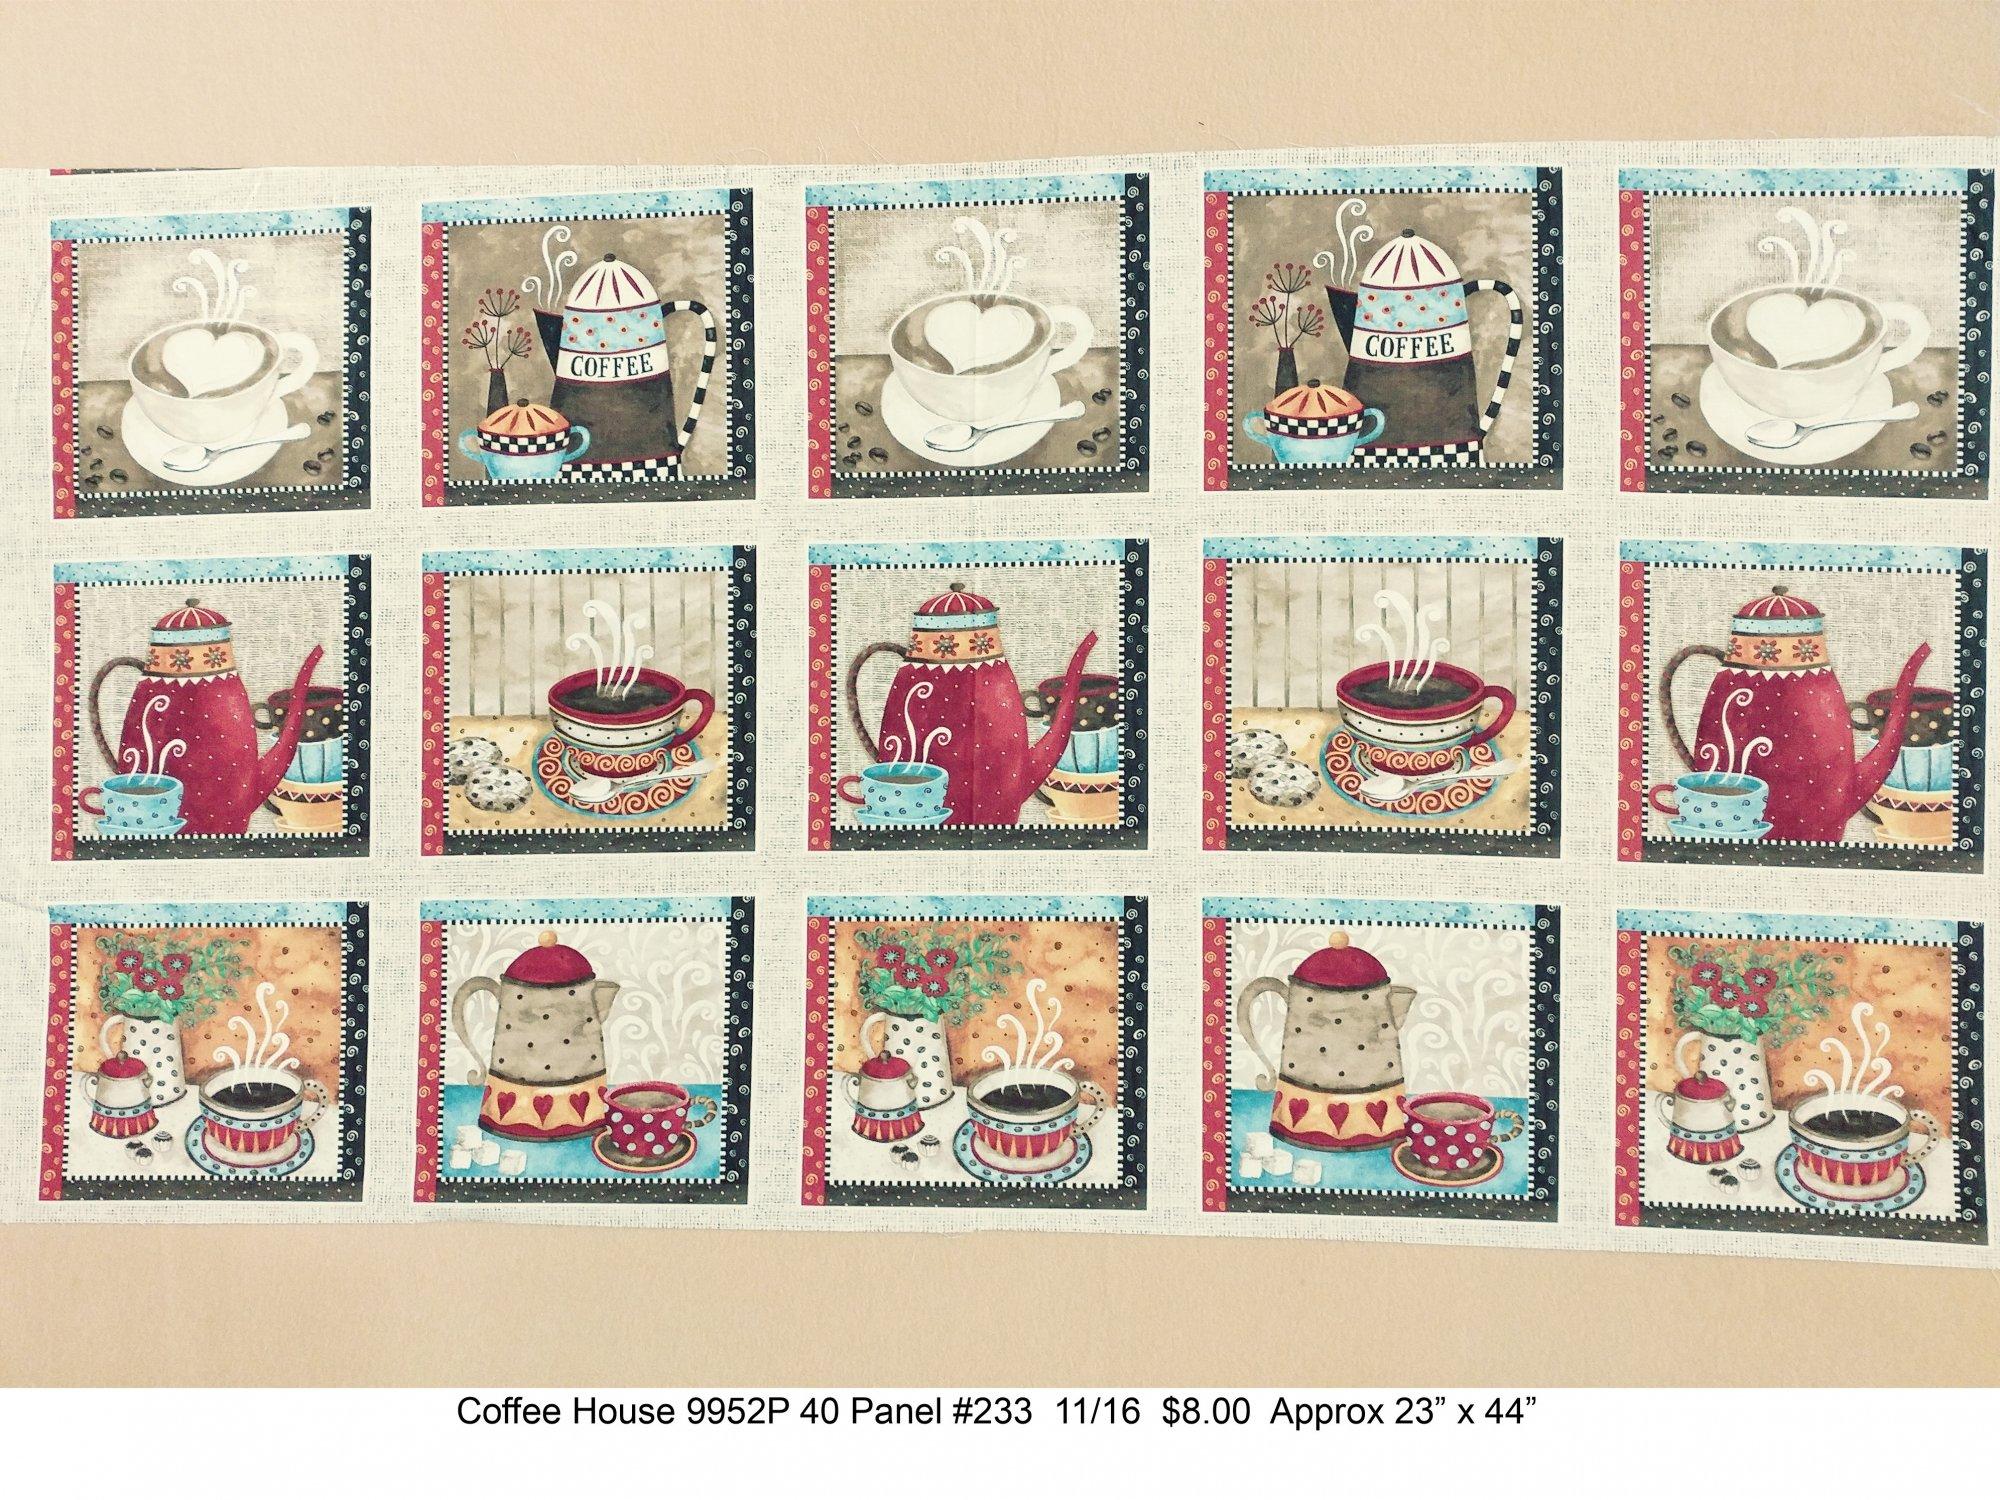 Coffee House 9952P 40 Panel #233